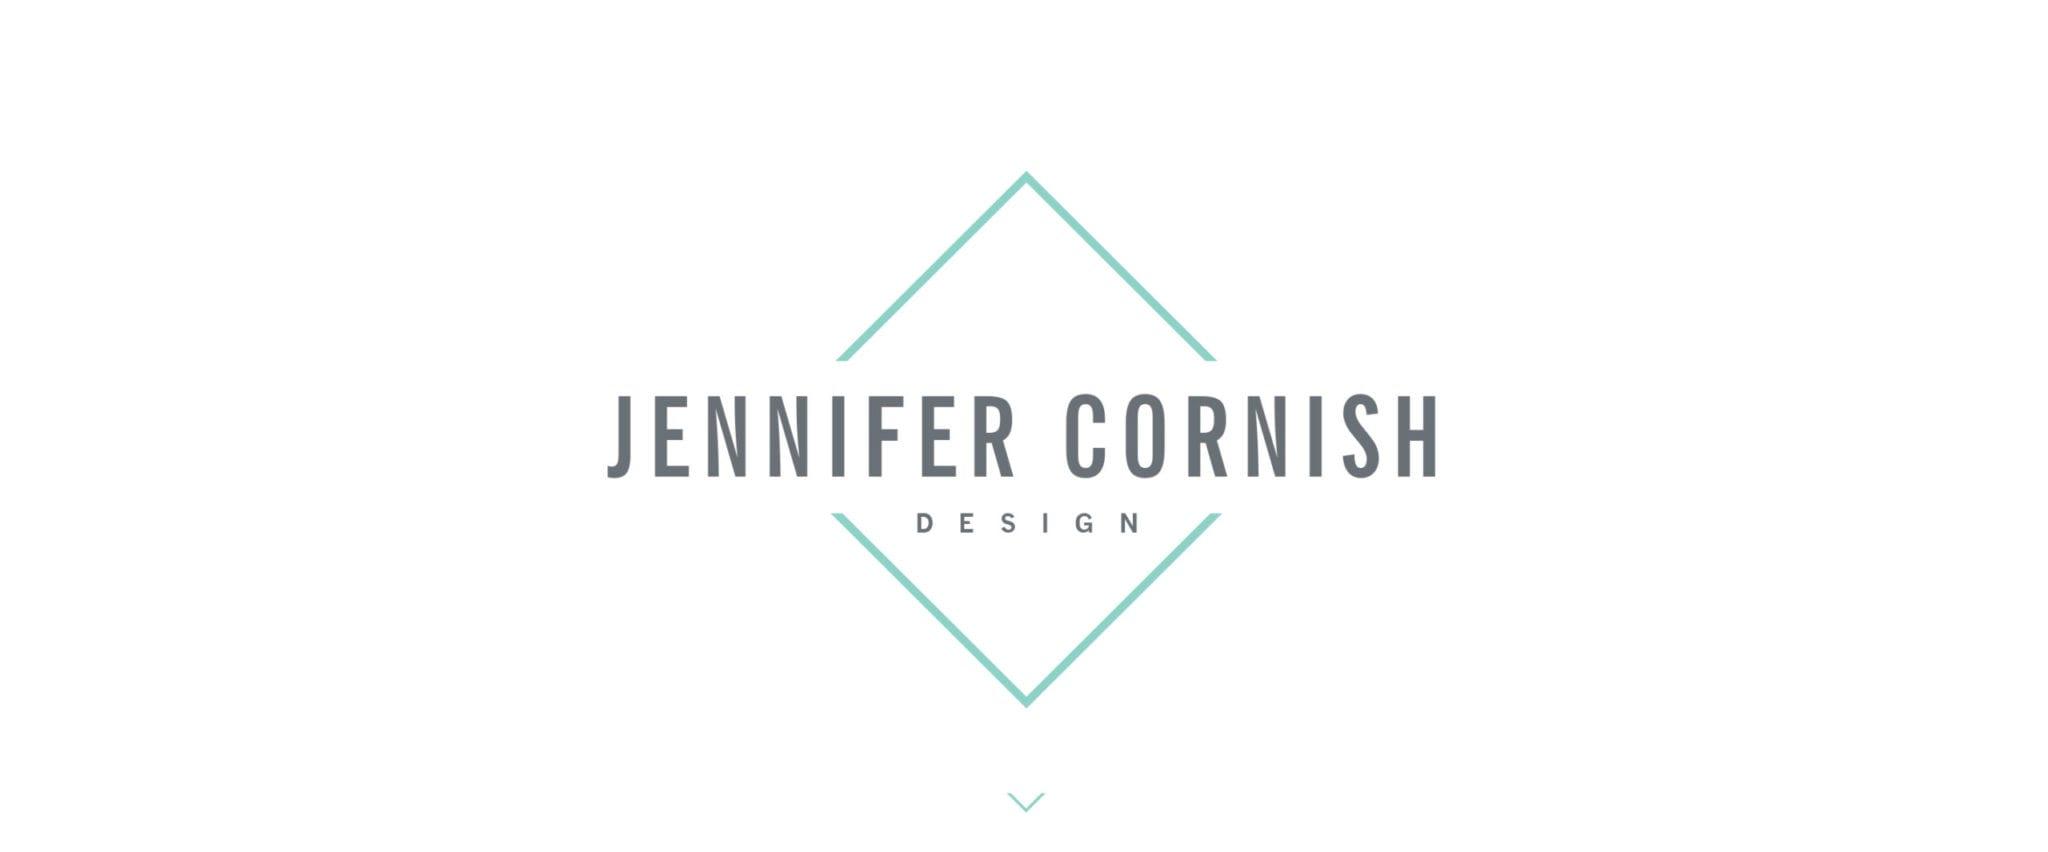 Jennifer Cornish Designs